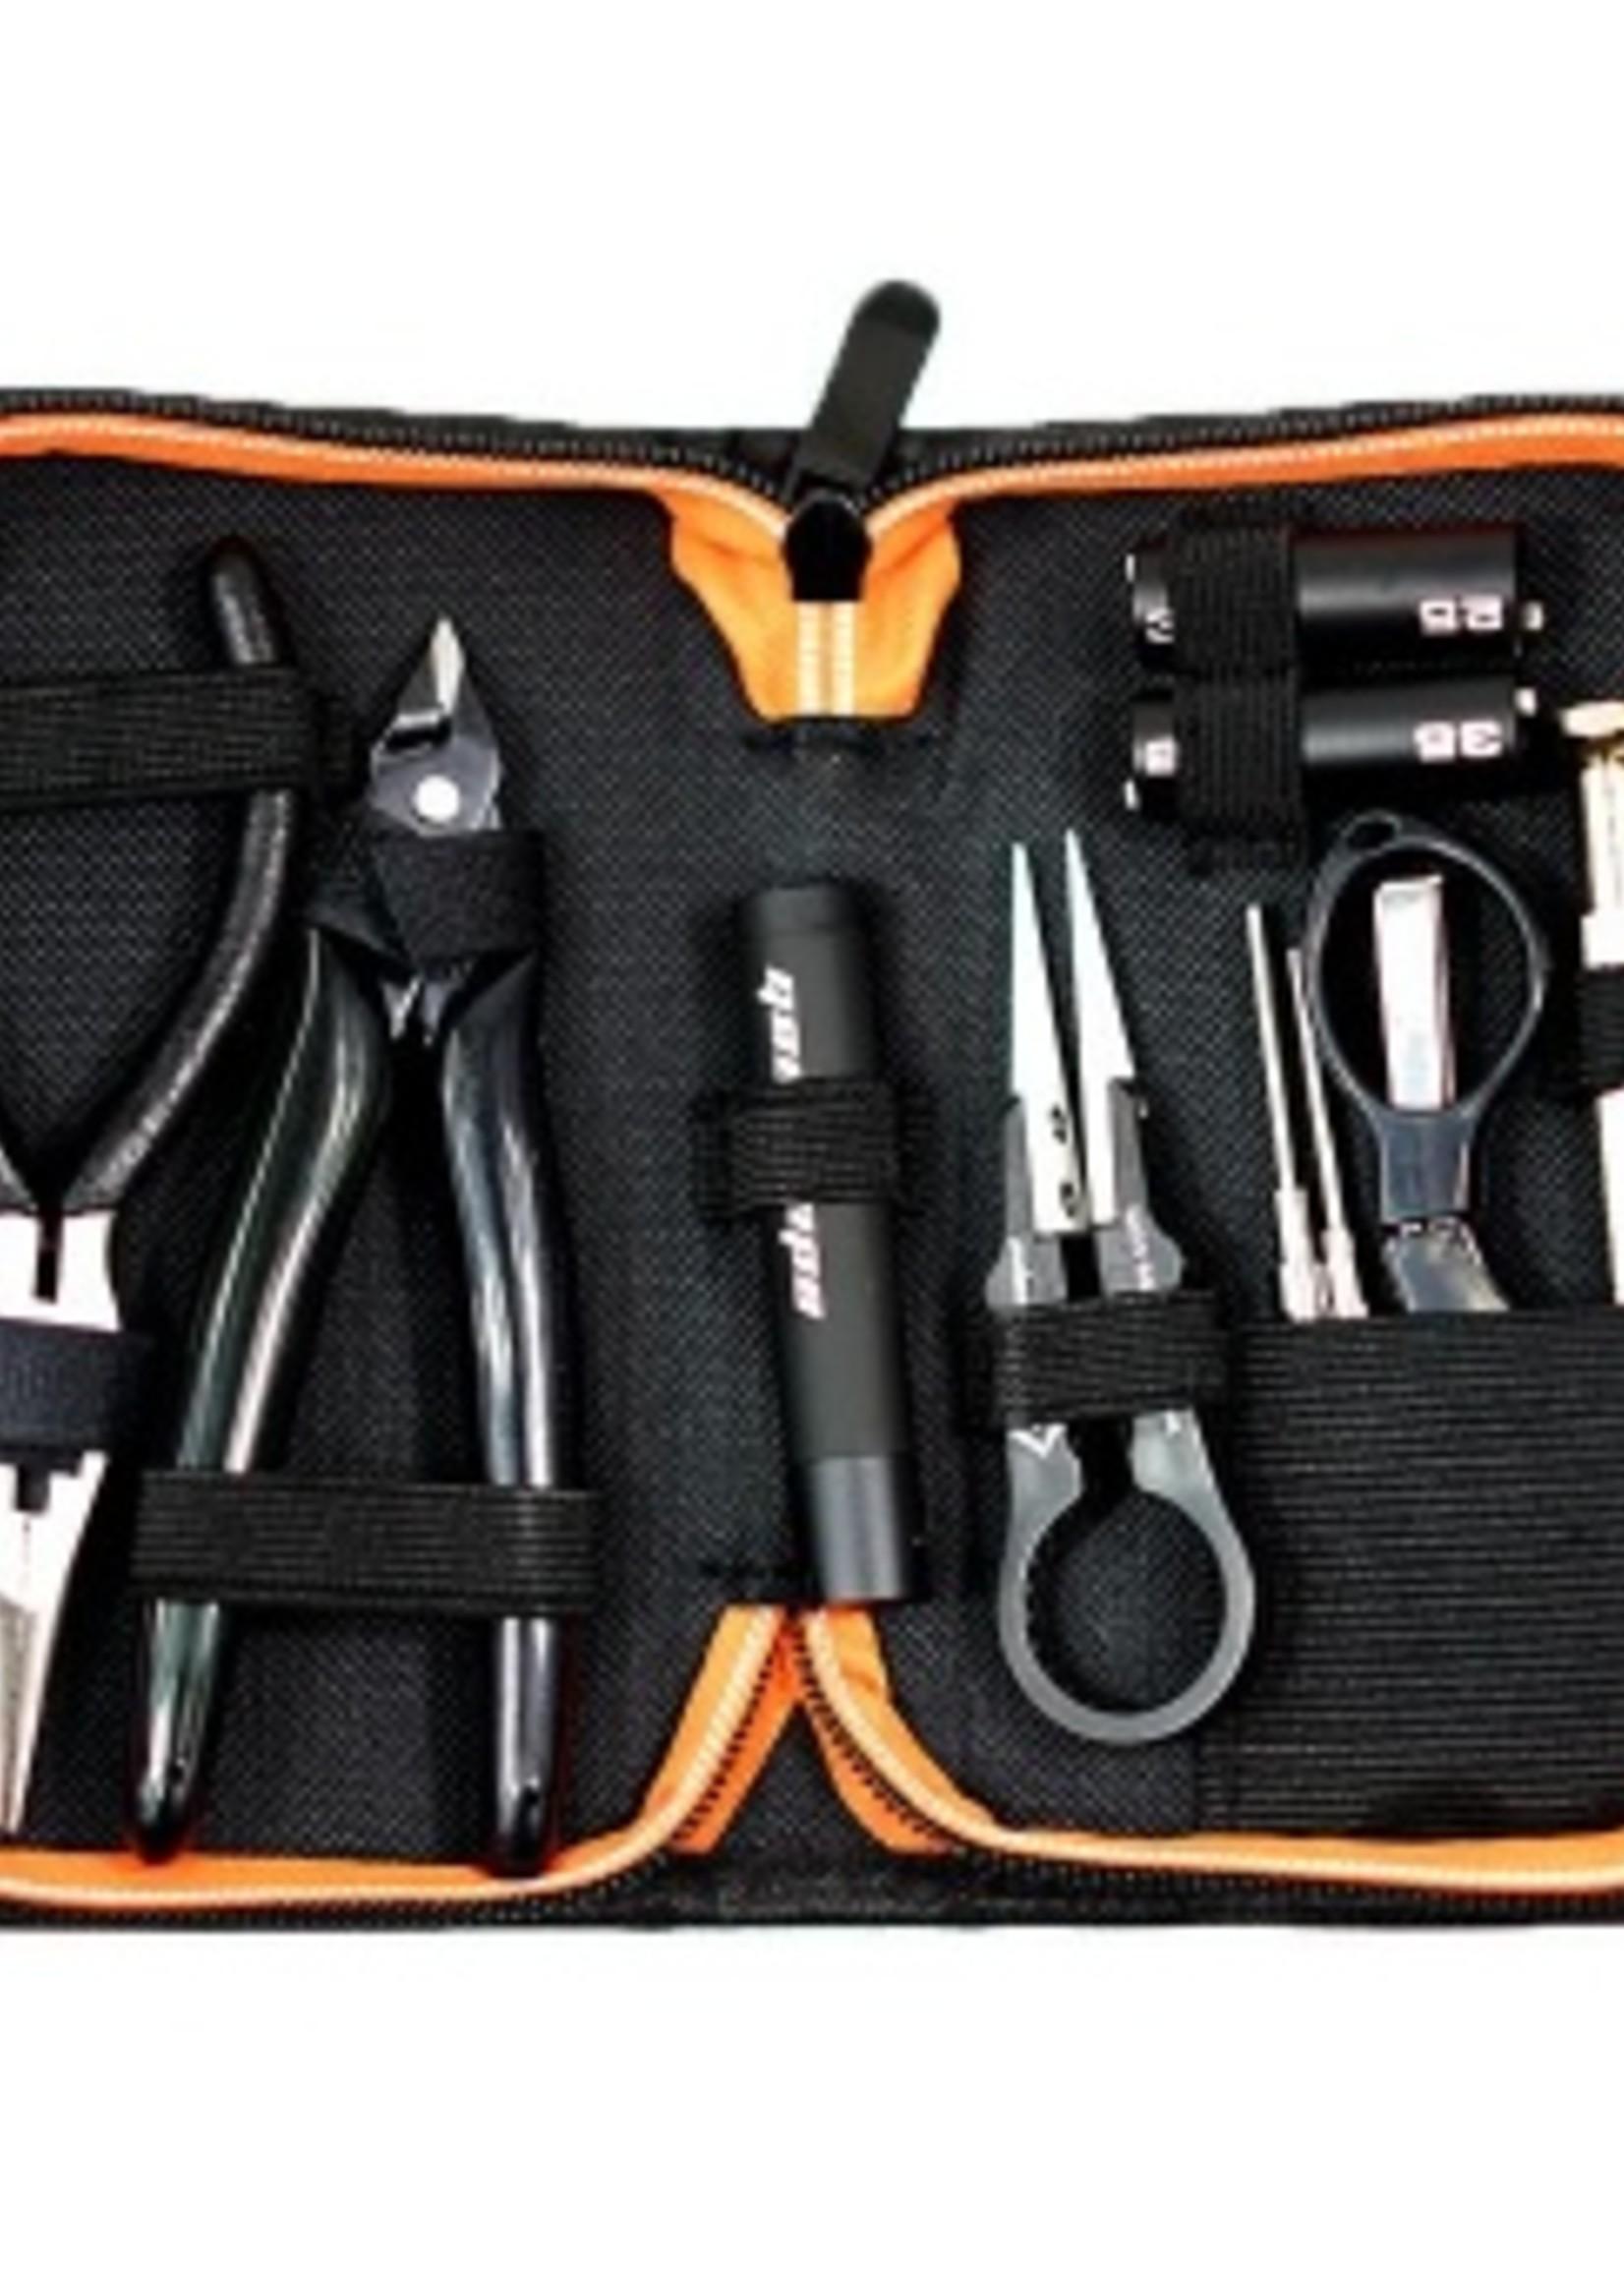 Geek Vape Geek Vape Tool Kit